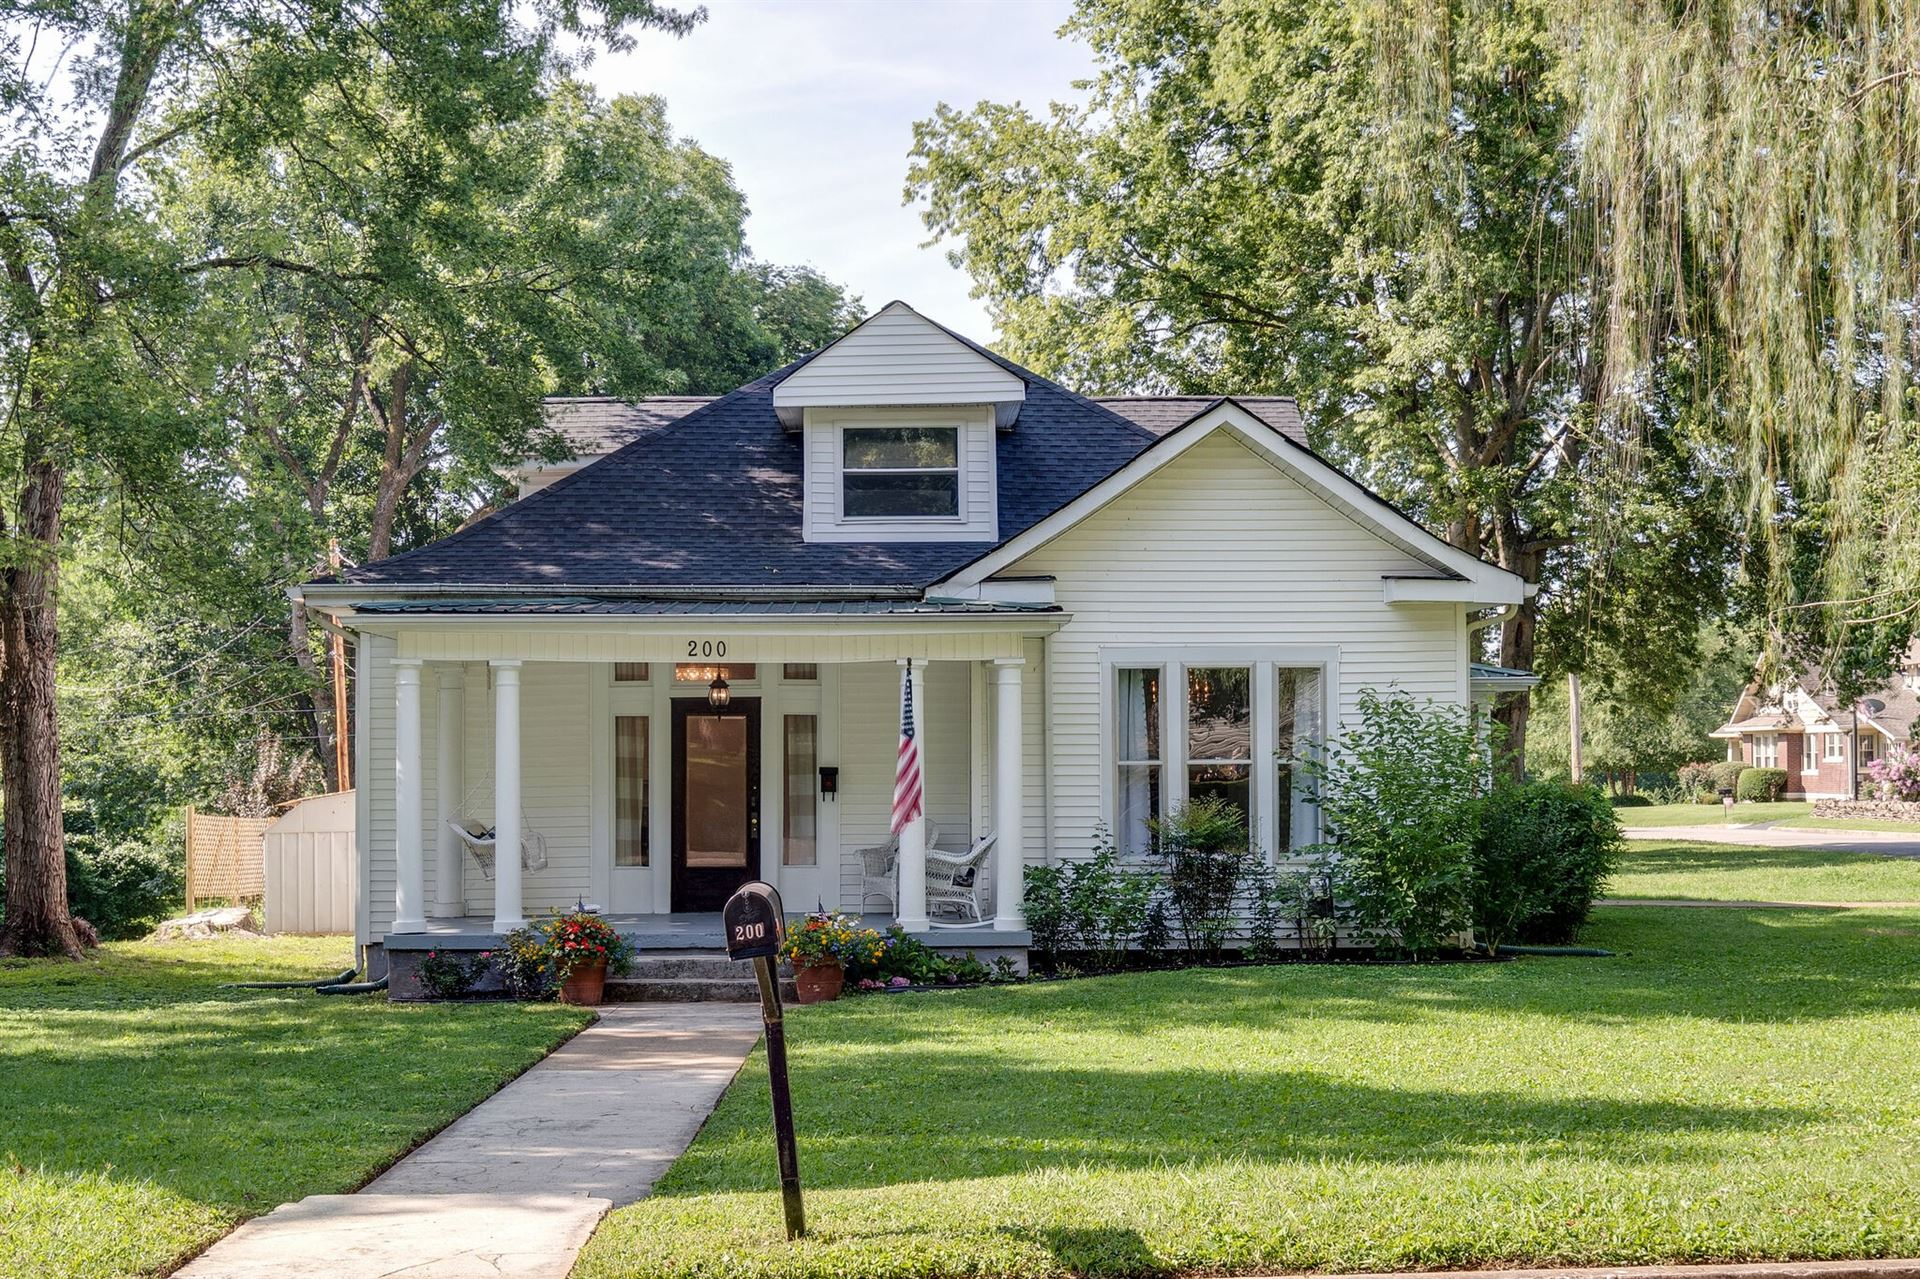 200 2nd Ave, Columbia, TN 38401 - MLS#: 2171024